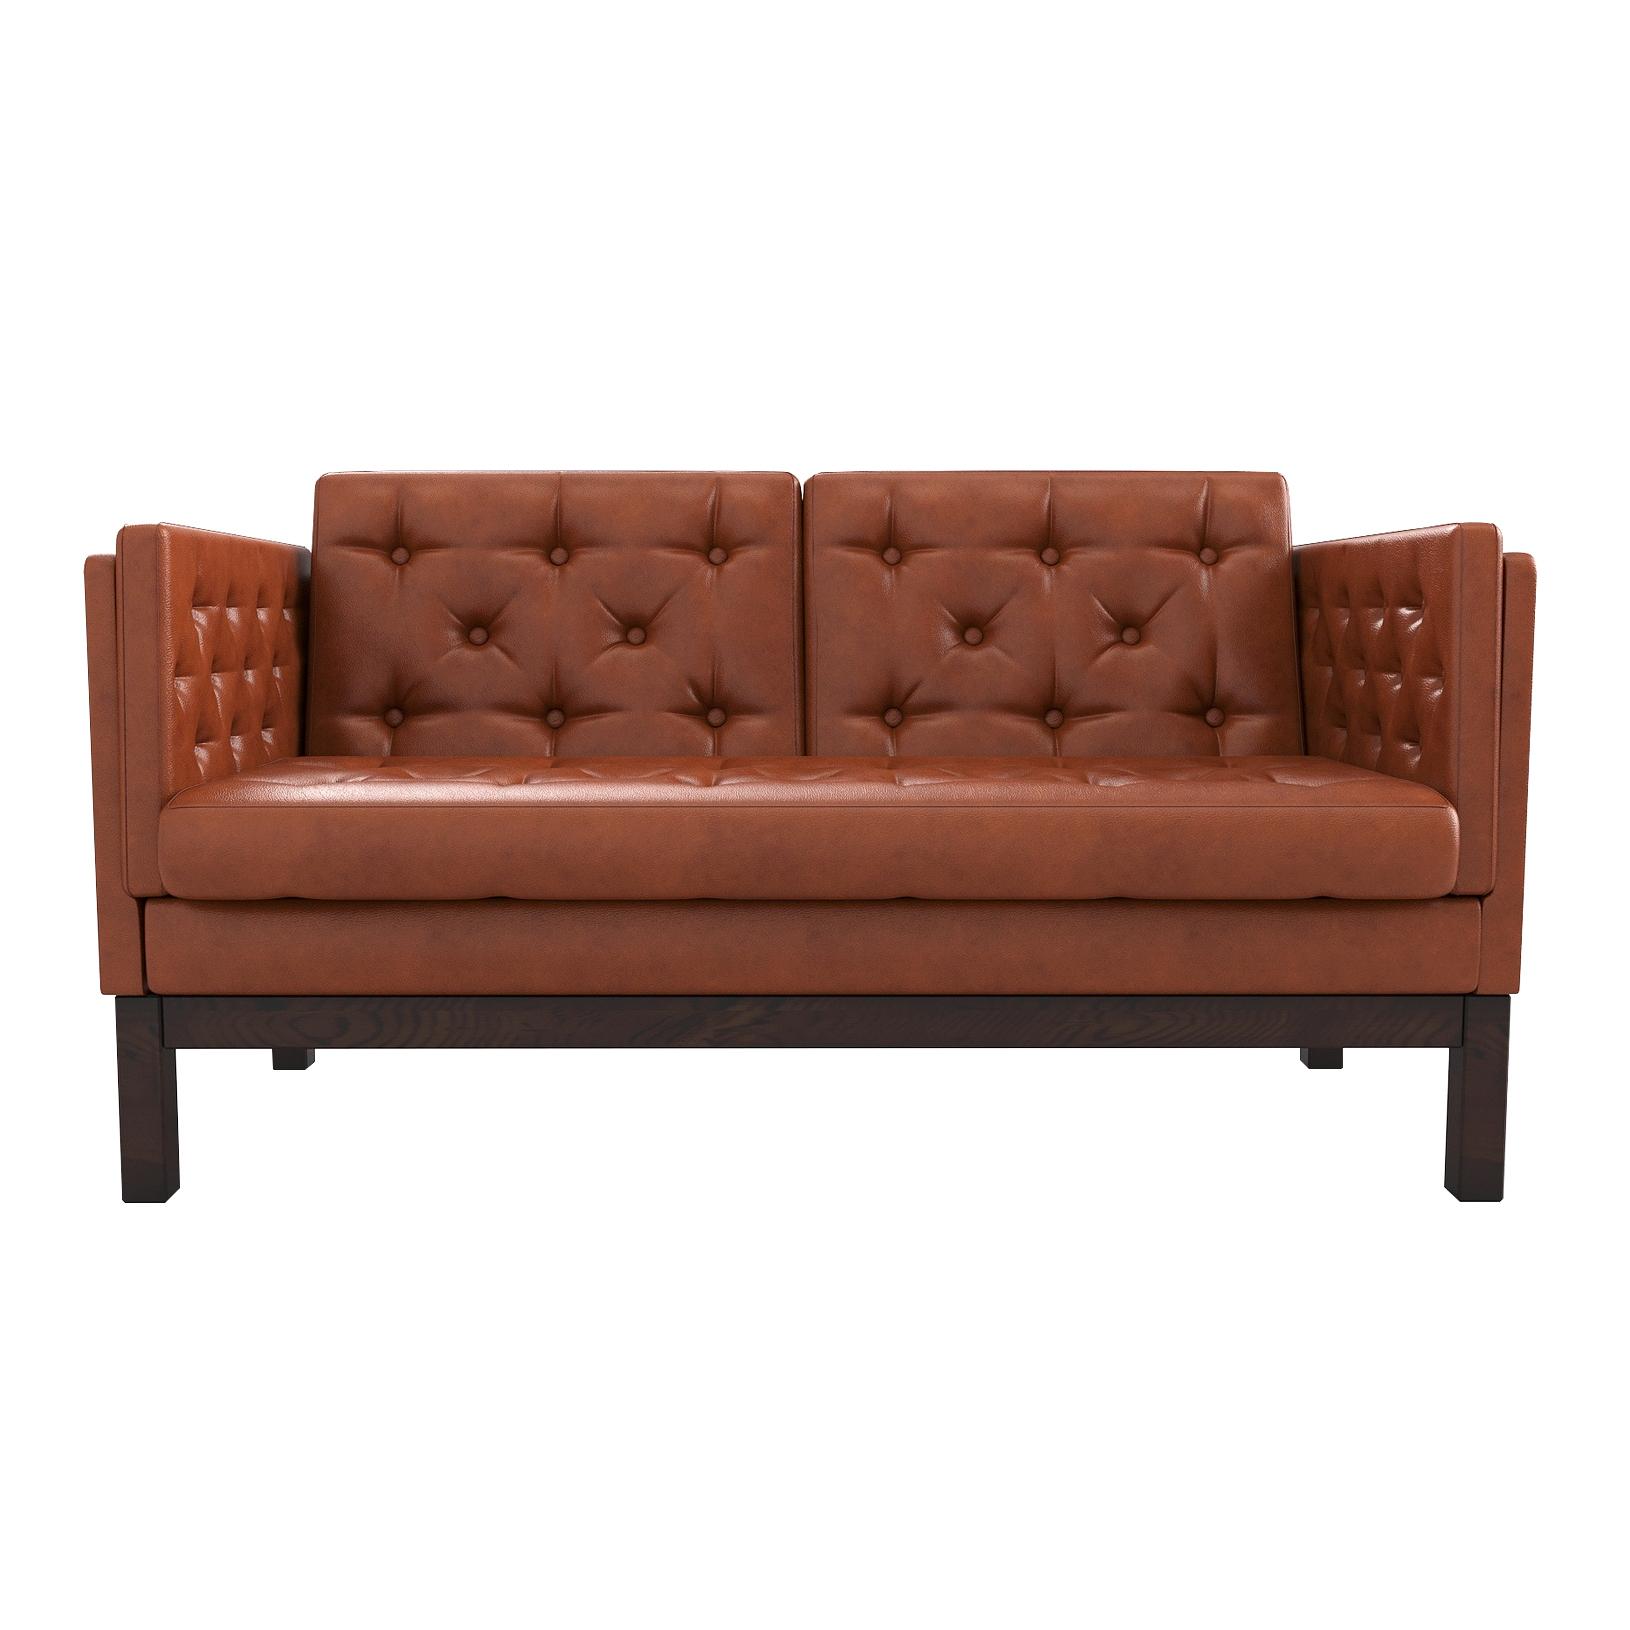 Фото - Диван AS Алана м 154x82x83 венге/оранжевый диван as алана м 154x82x83 сосна коричневый